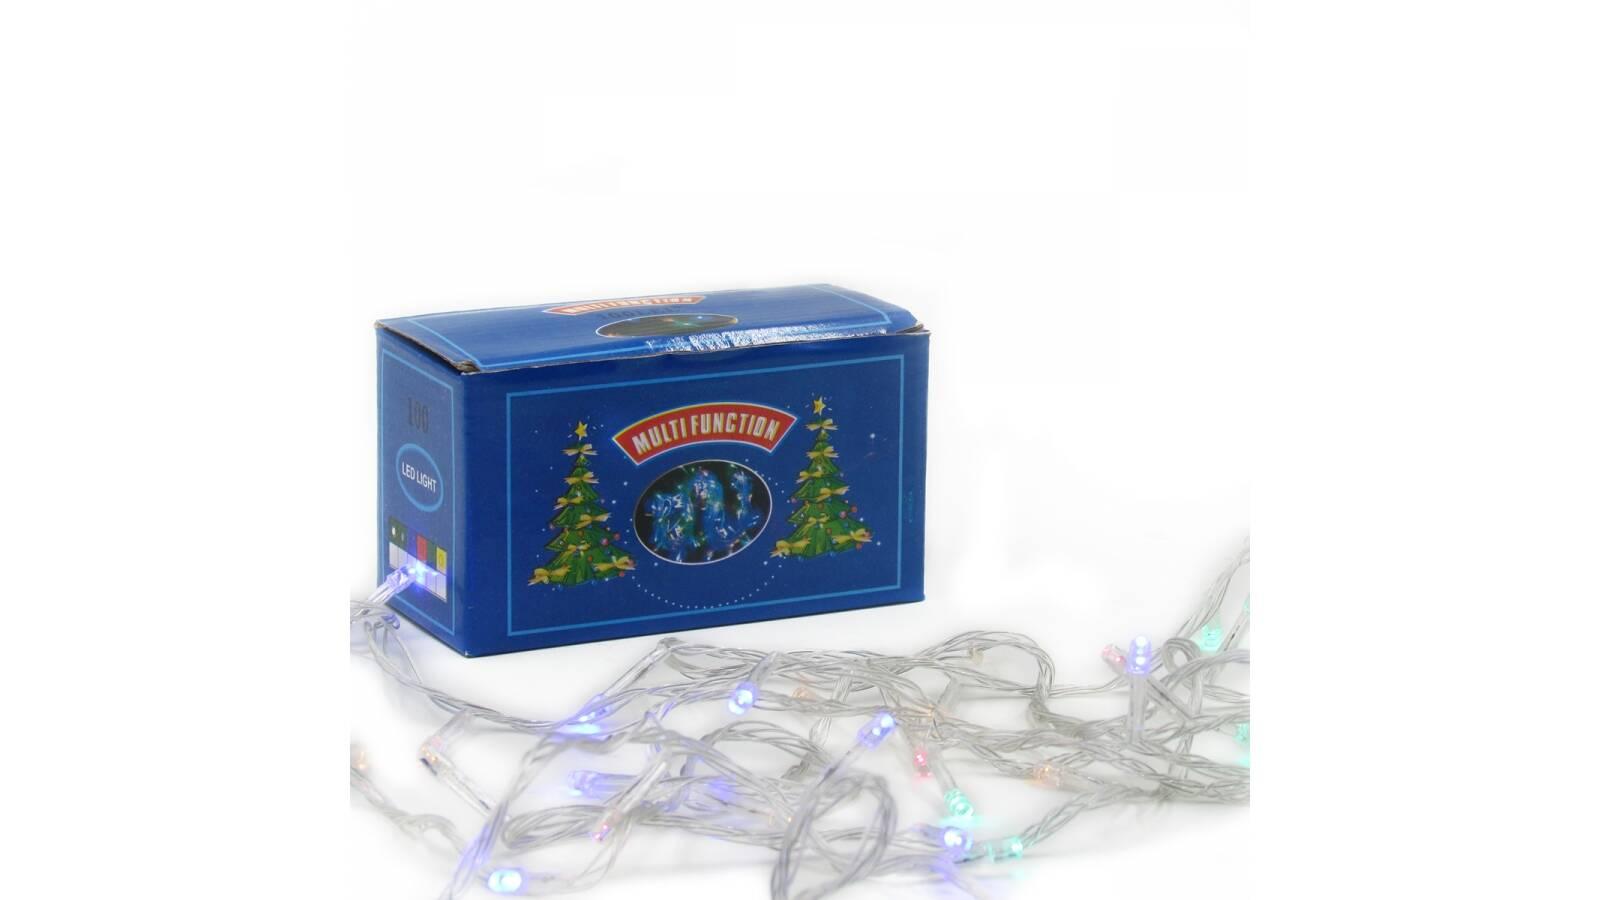 Luces LED de Navidad x 100 - 9 Metros Blanca o Colores